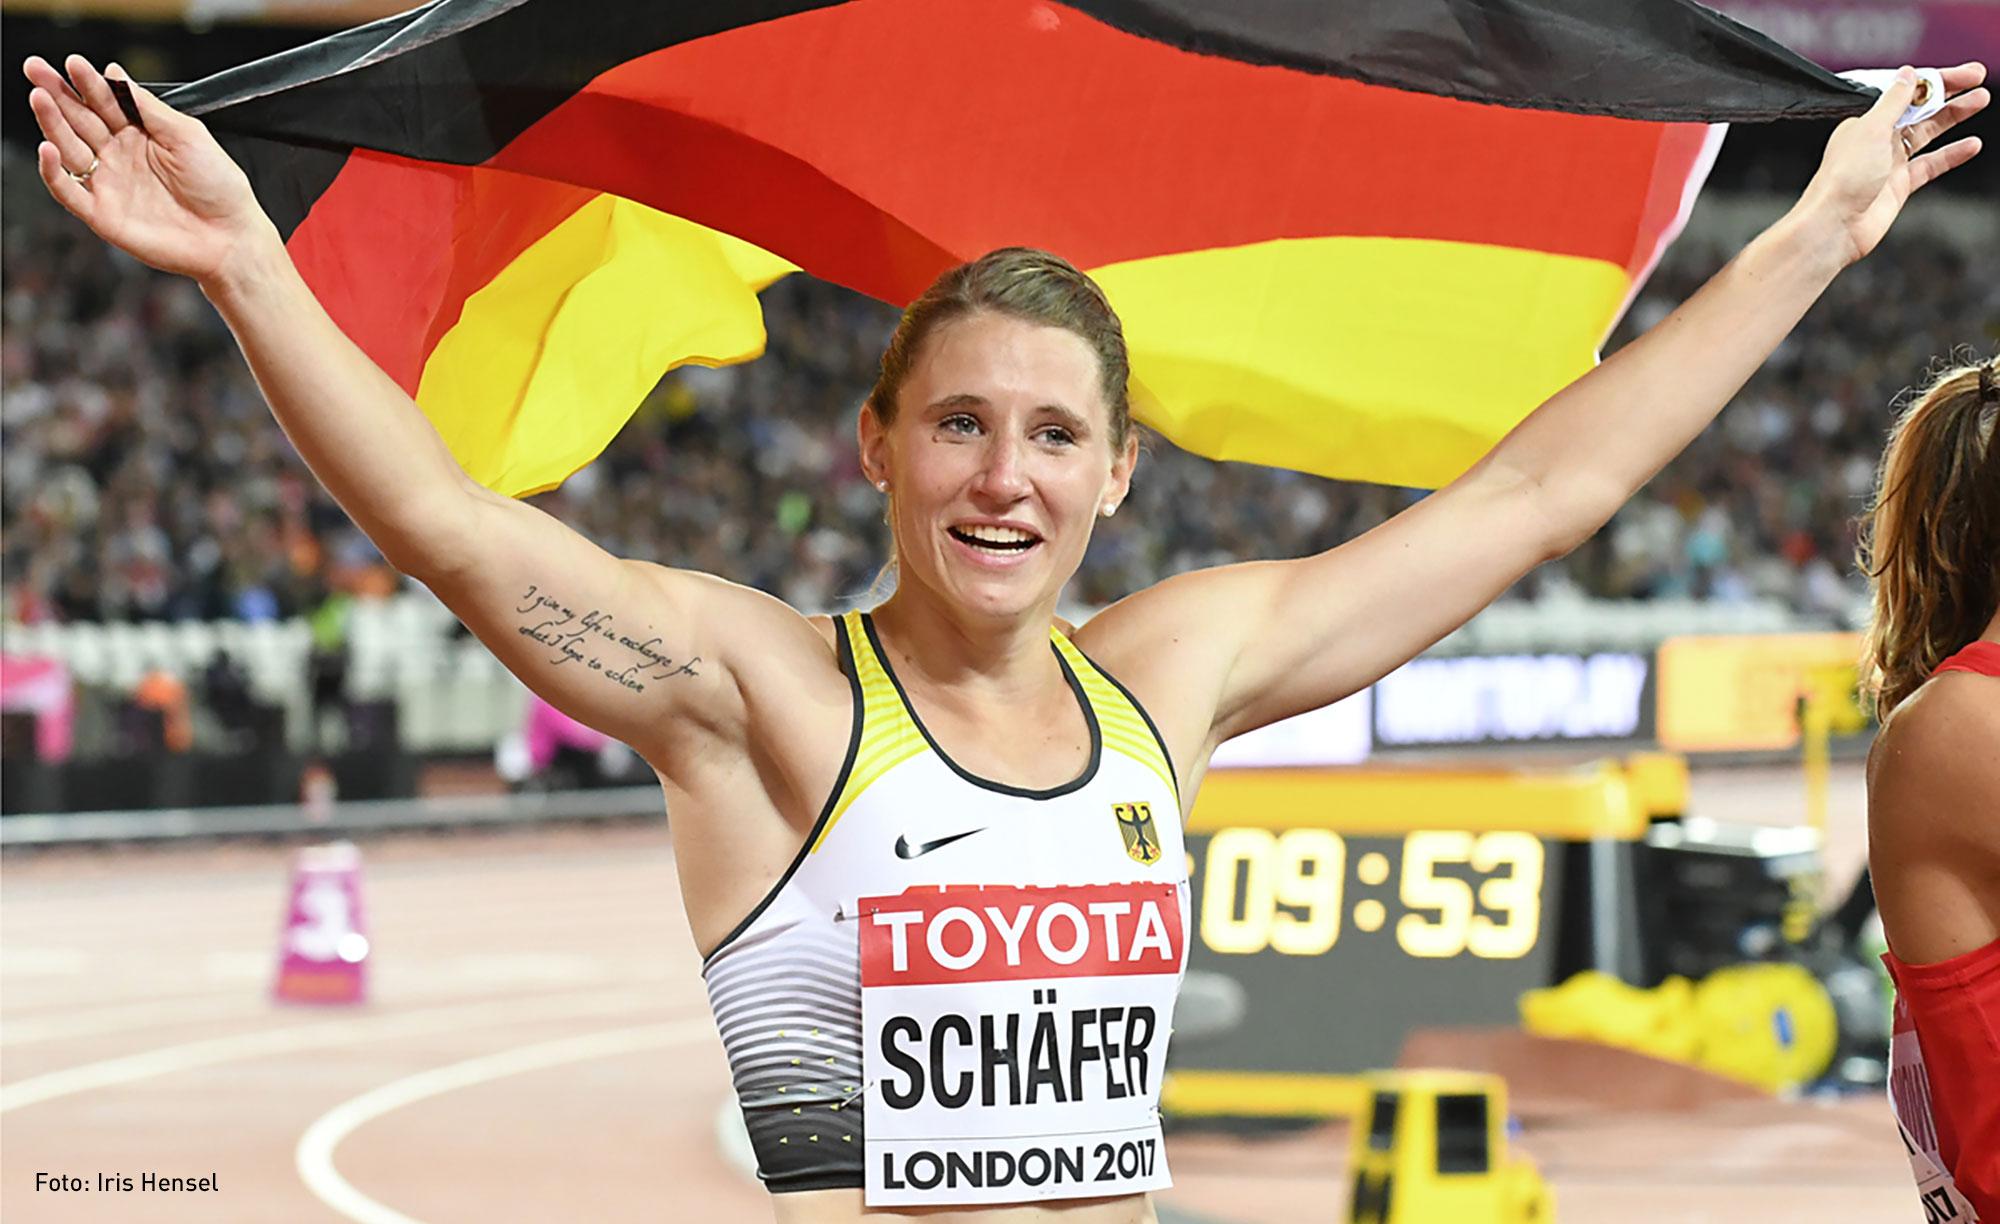 Wir gratulieren Carolin Schäfer zur Vizeweltmeisterschaft!